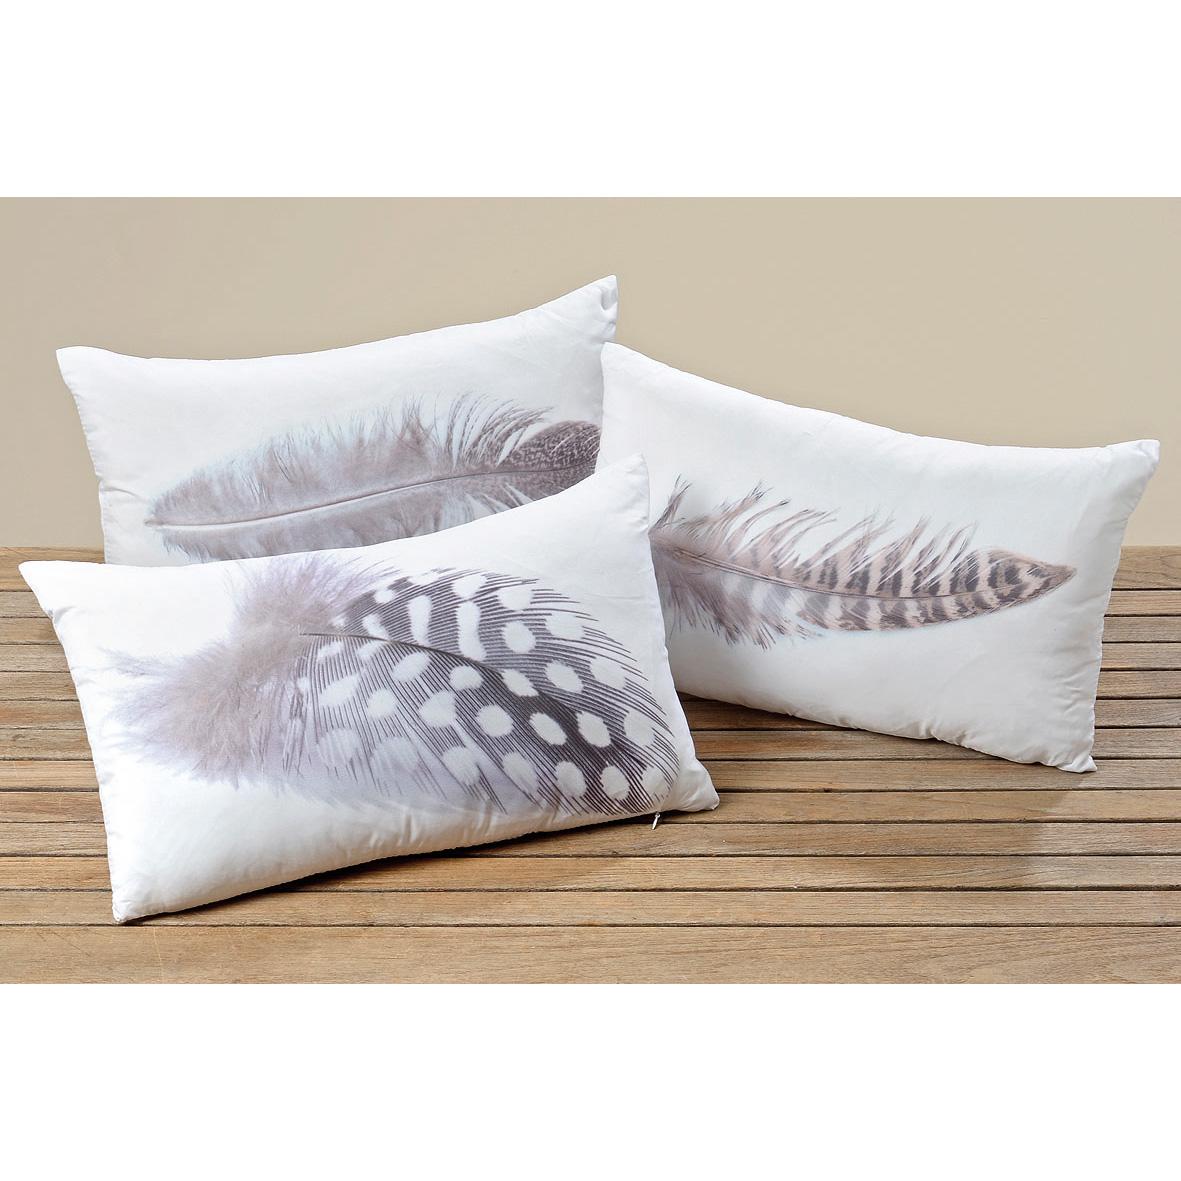 kissen mit federmotiv 30 x 50cm wei grau mod c 032233. Black Bedroom Furniture Sets. Home Design Ideas